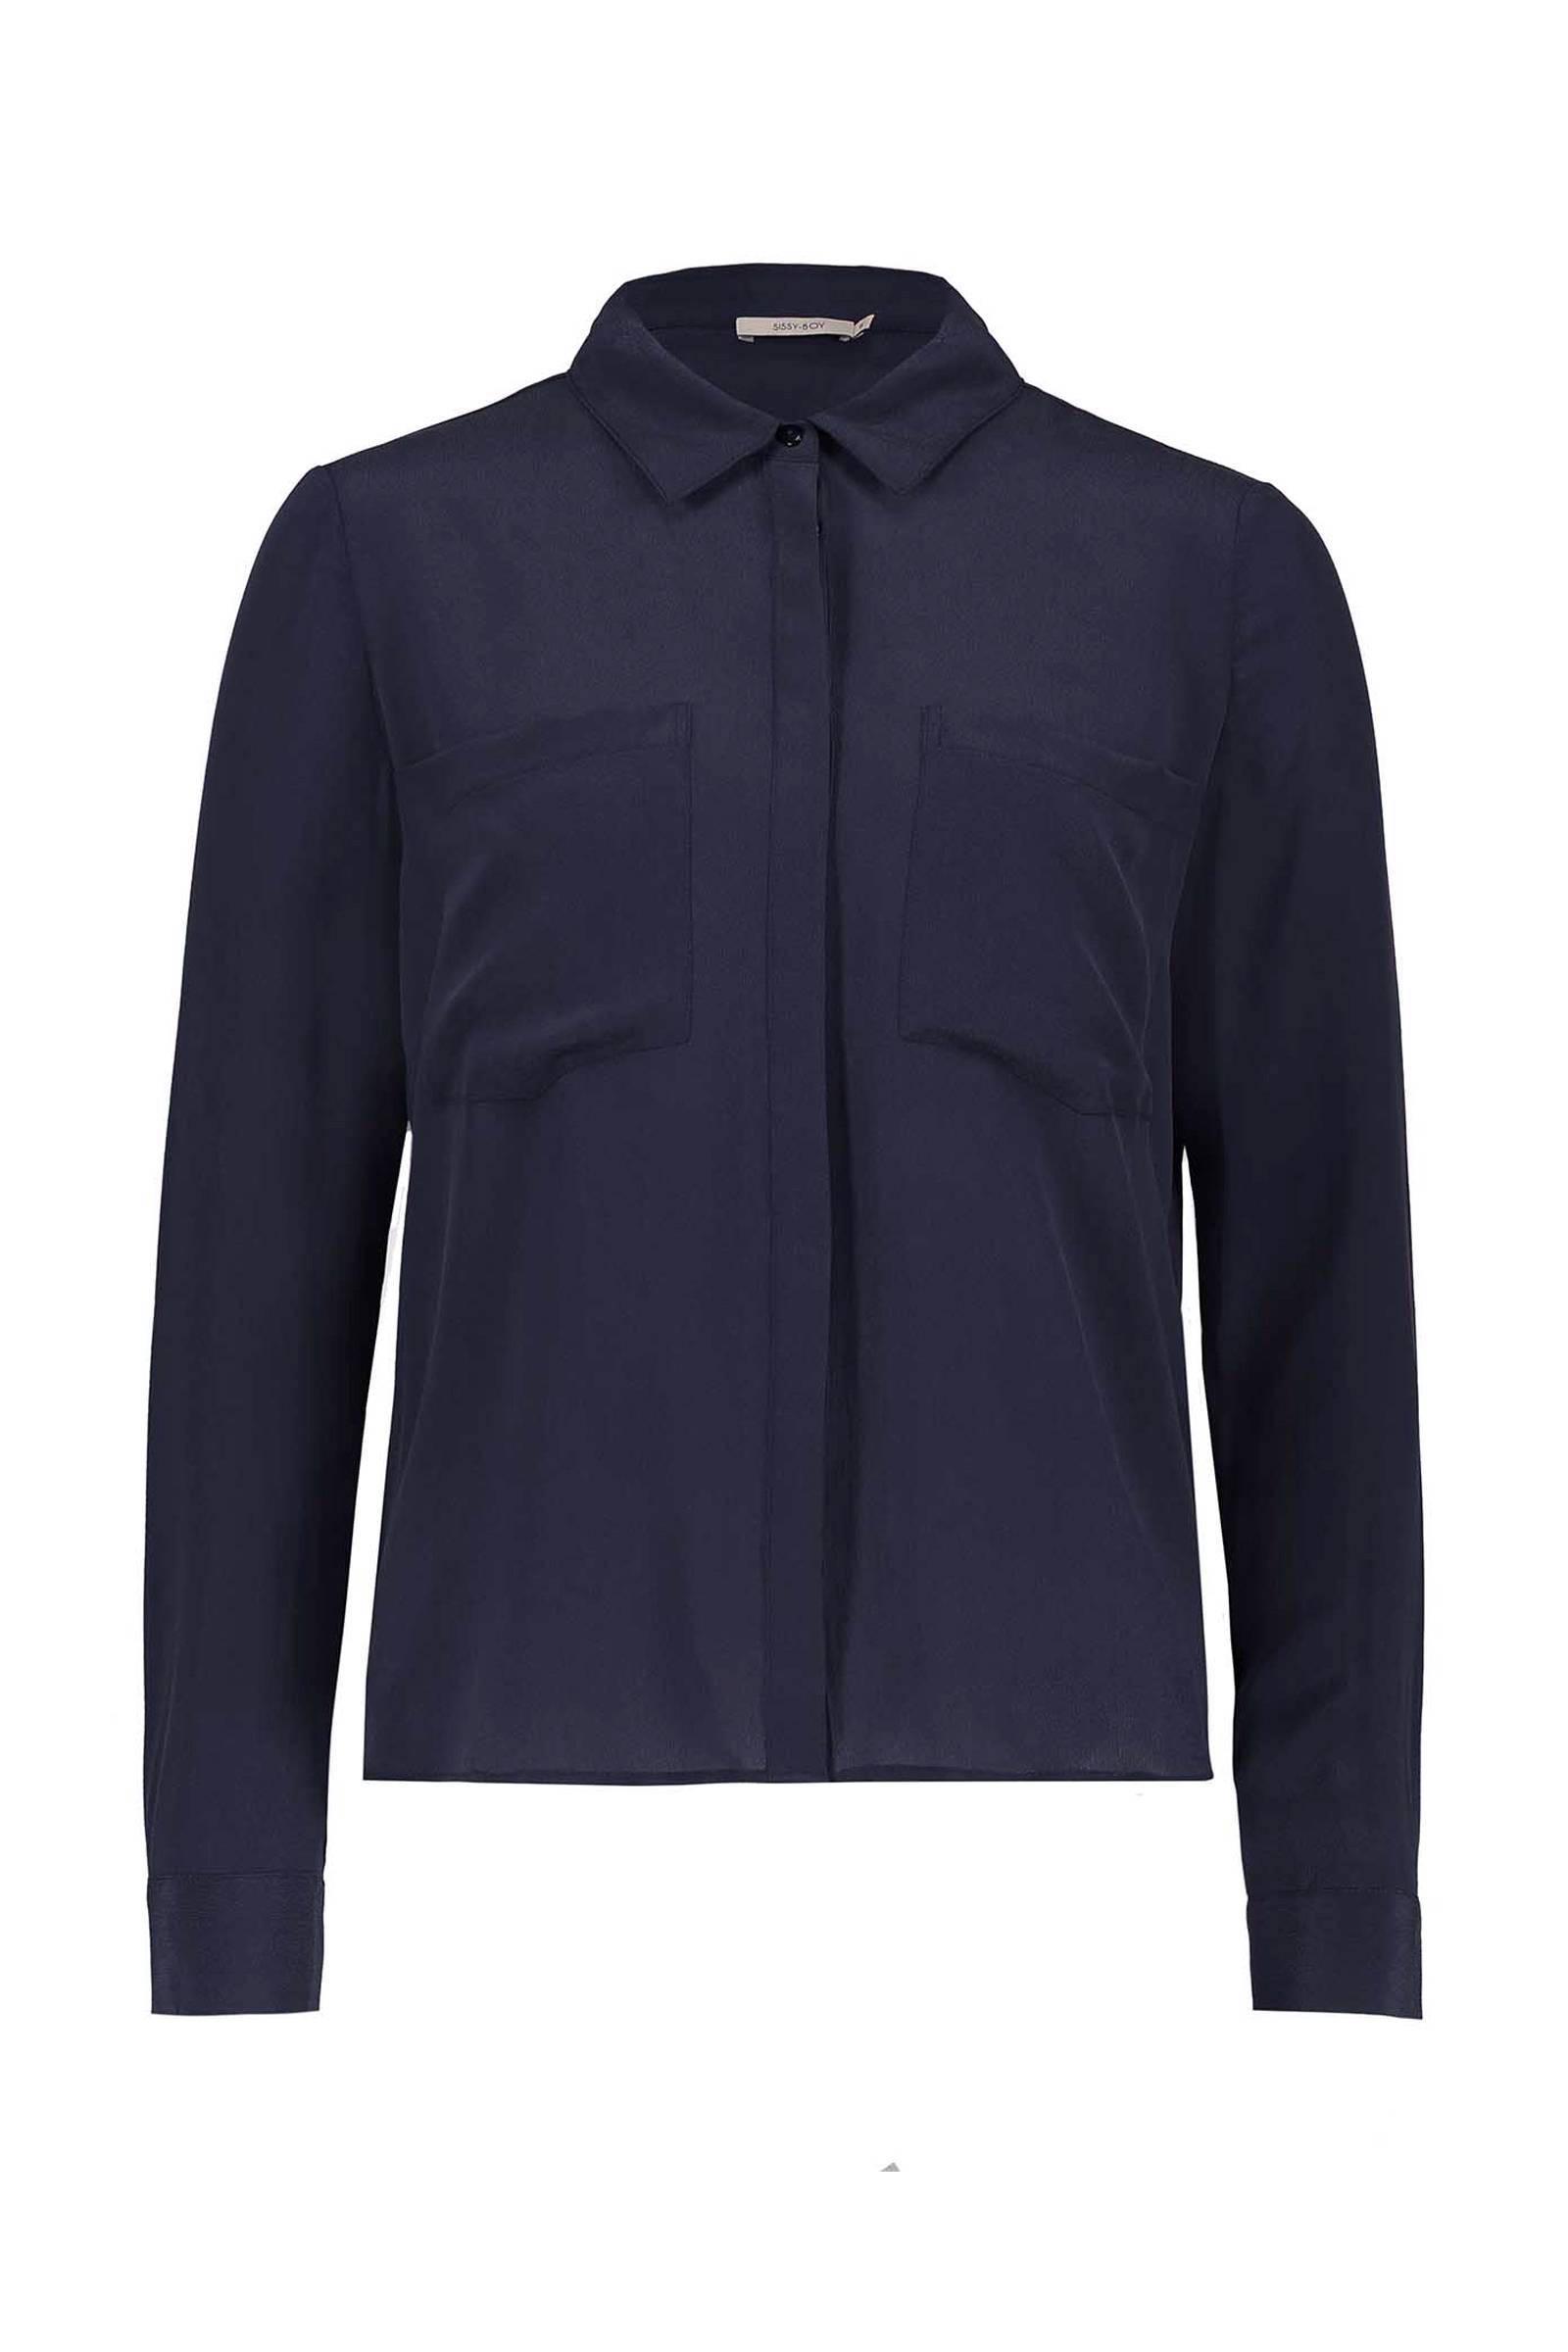 Zijden overhemdblouse Donker marineblauw DAMES | H&M NL